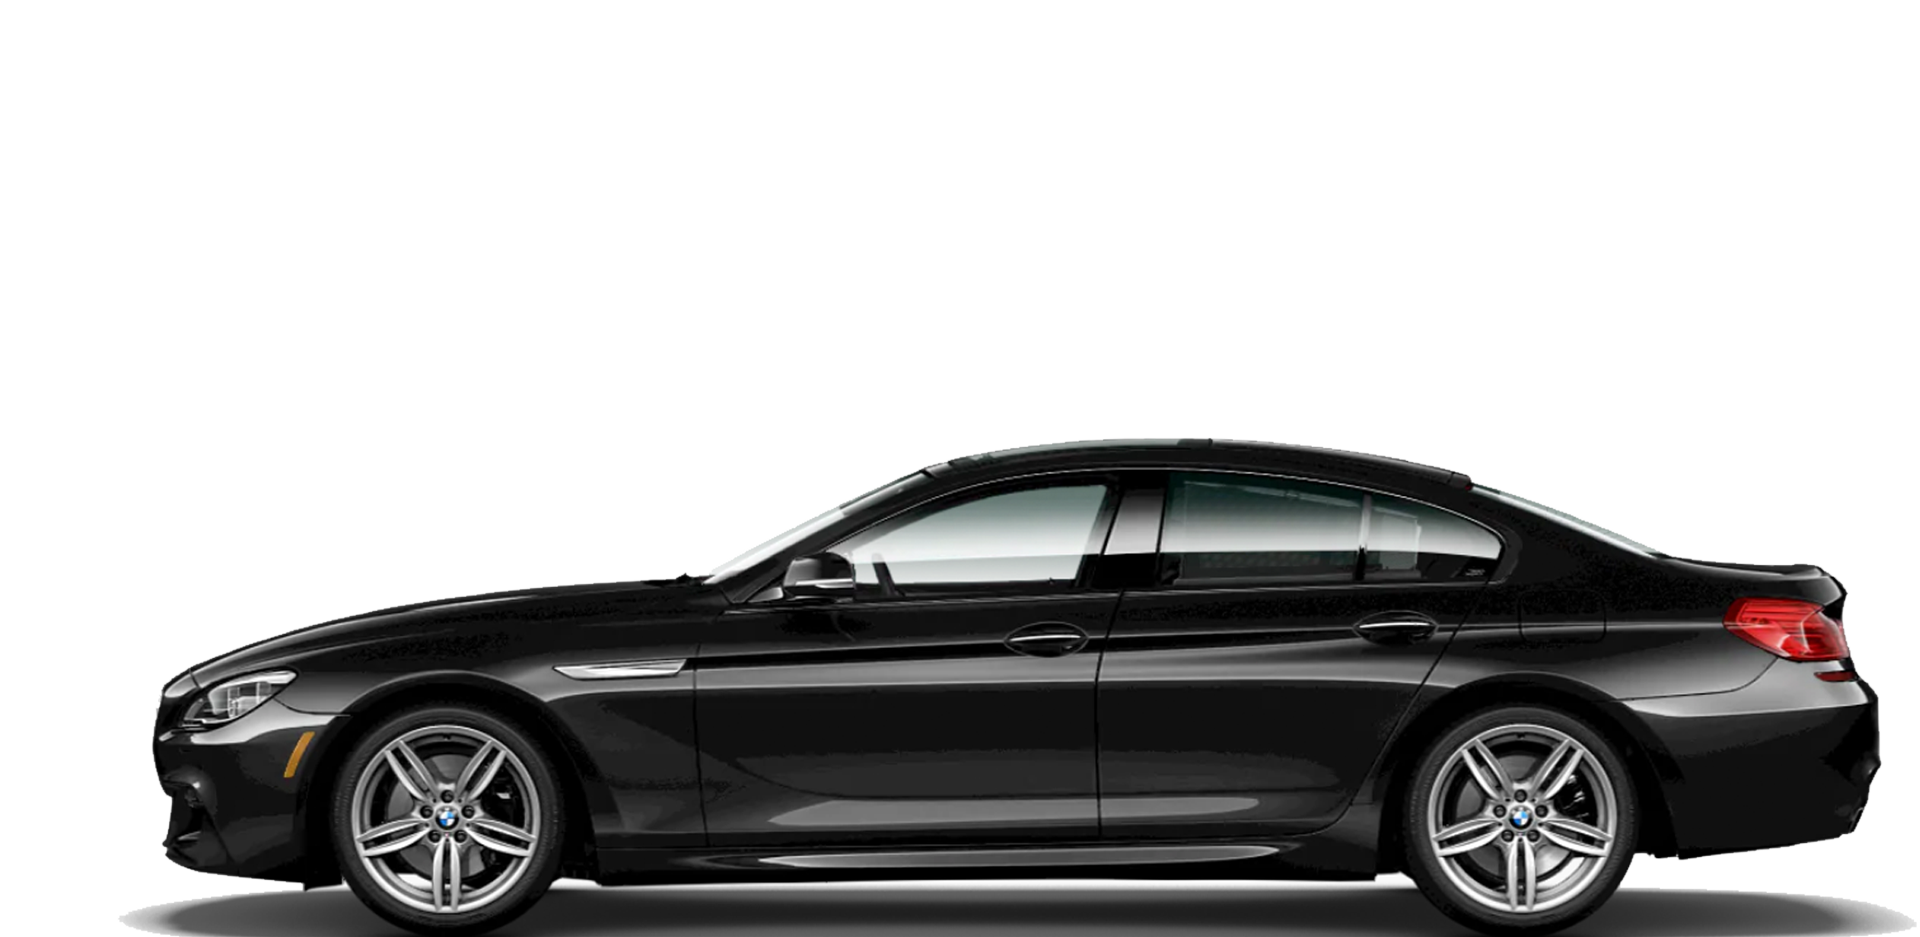 6 Series BMW Century West BMW